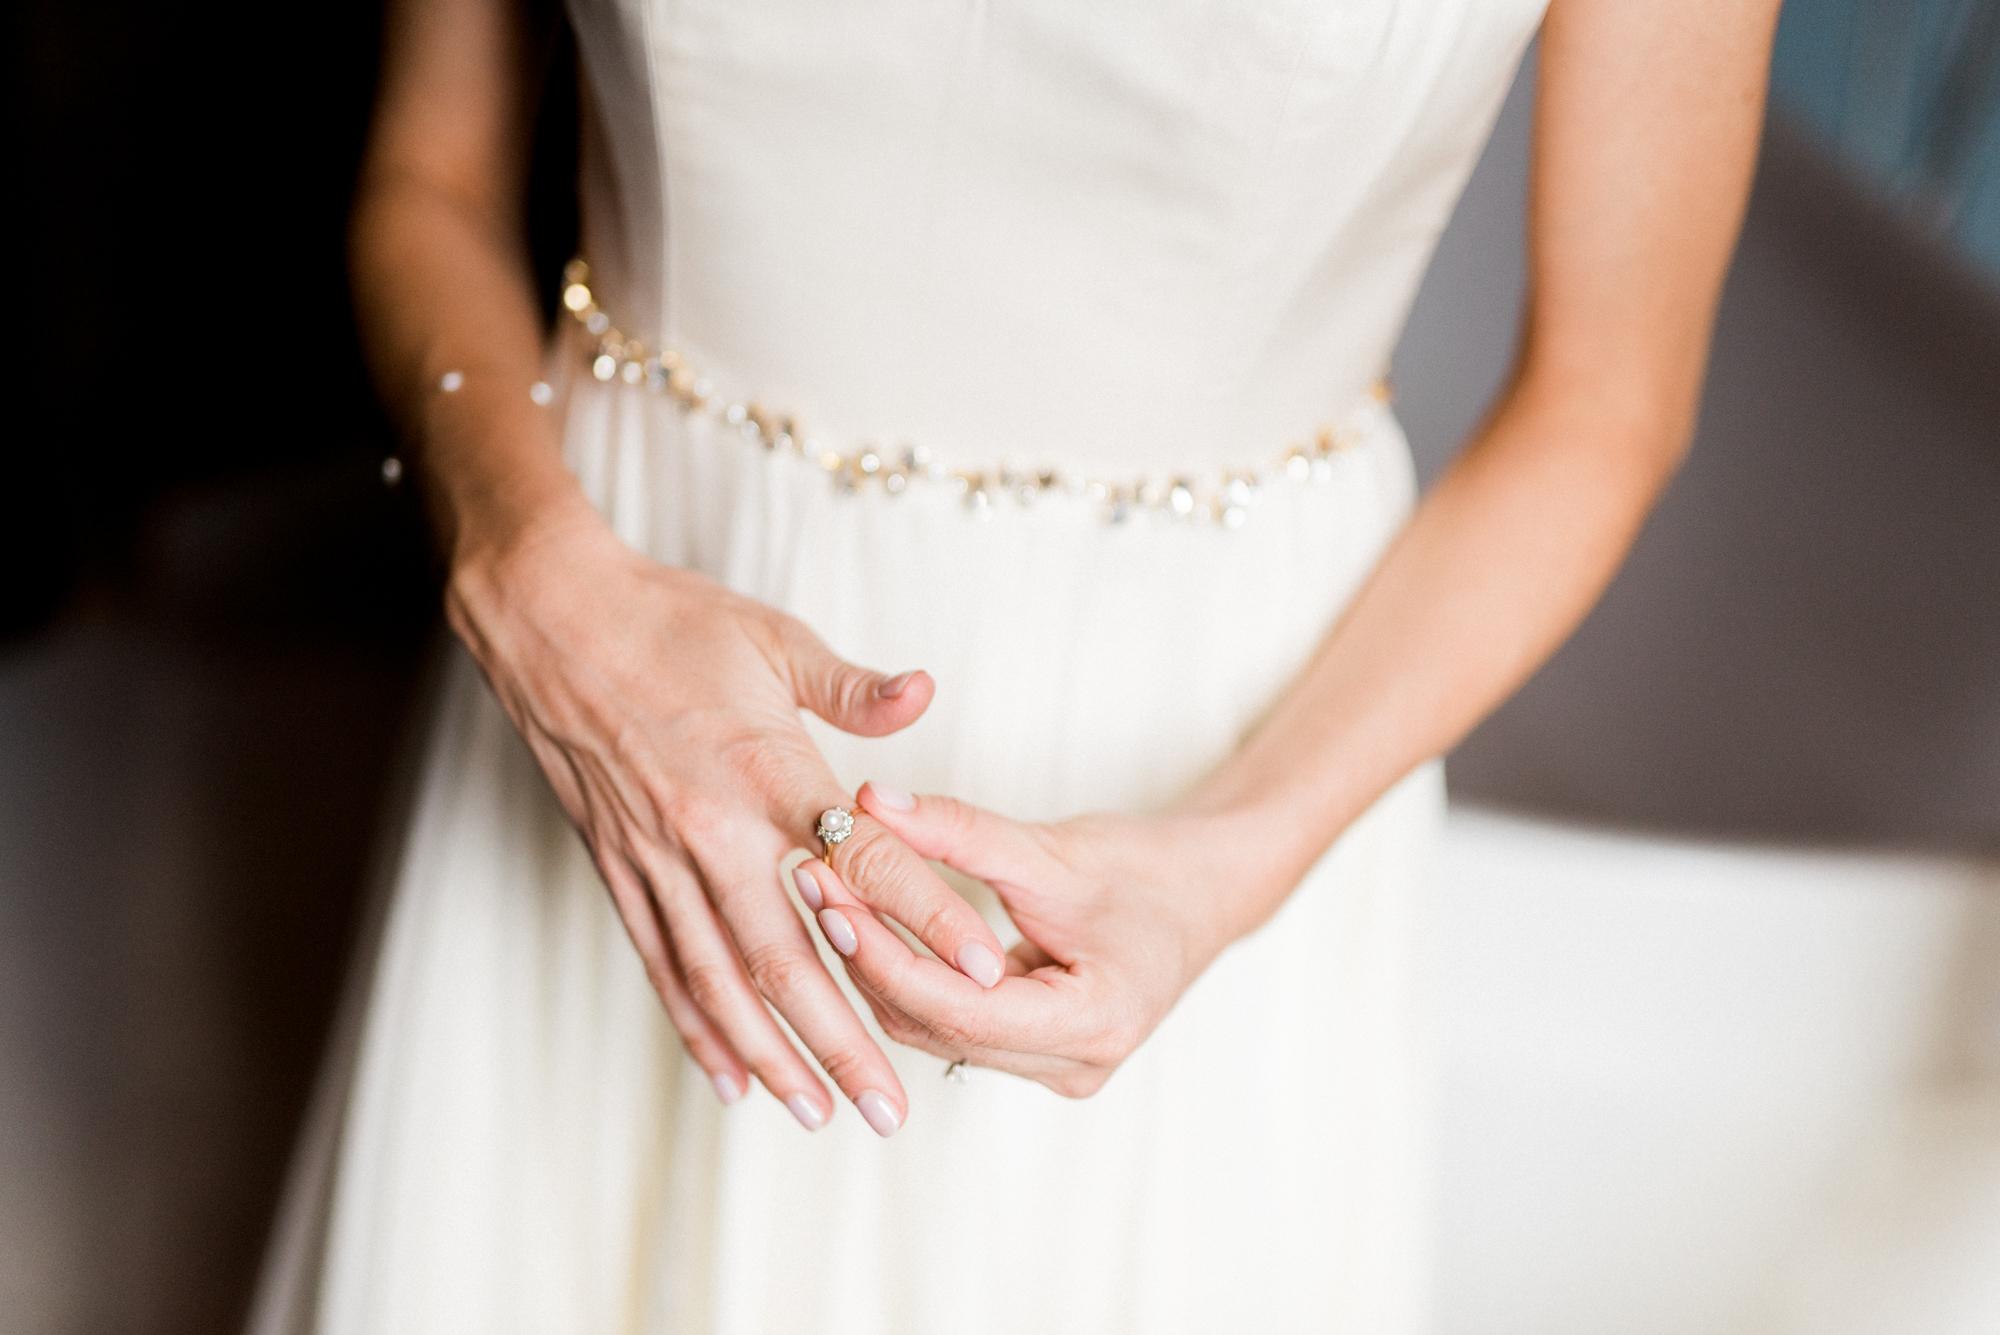 haley-richter-photography-maas-building-summer-wedding-philadelphia-DIY-birchtree-030.jpg